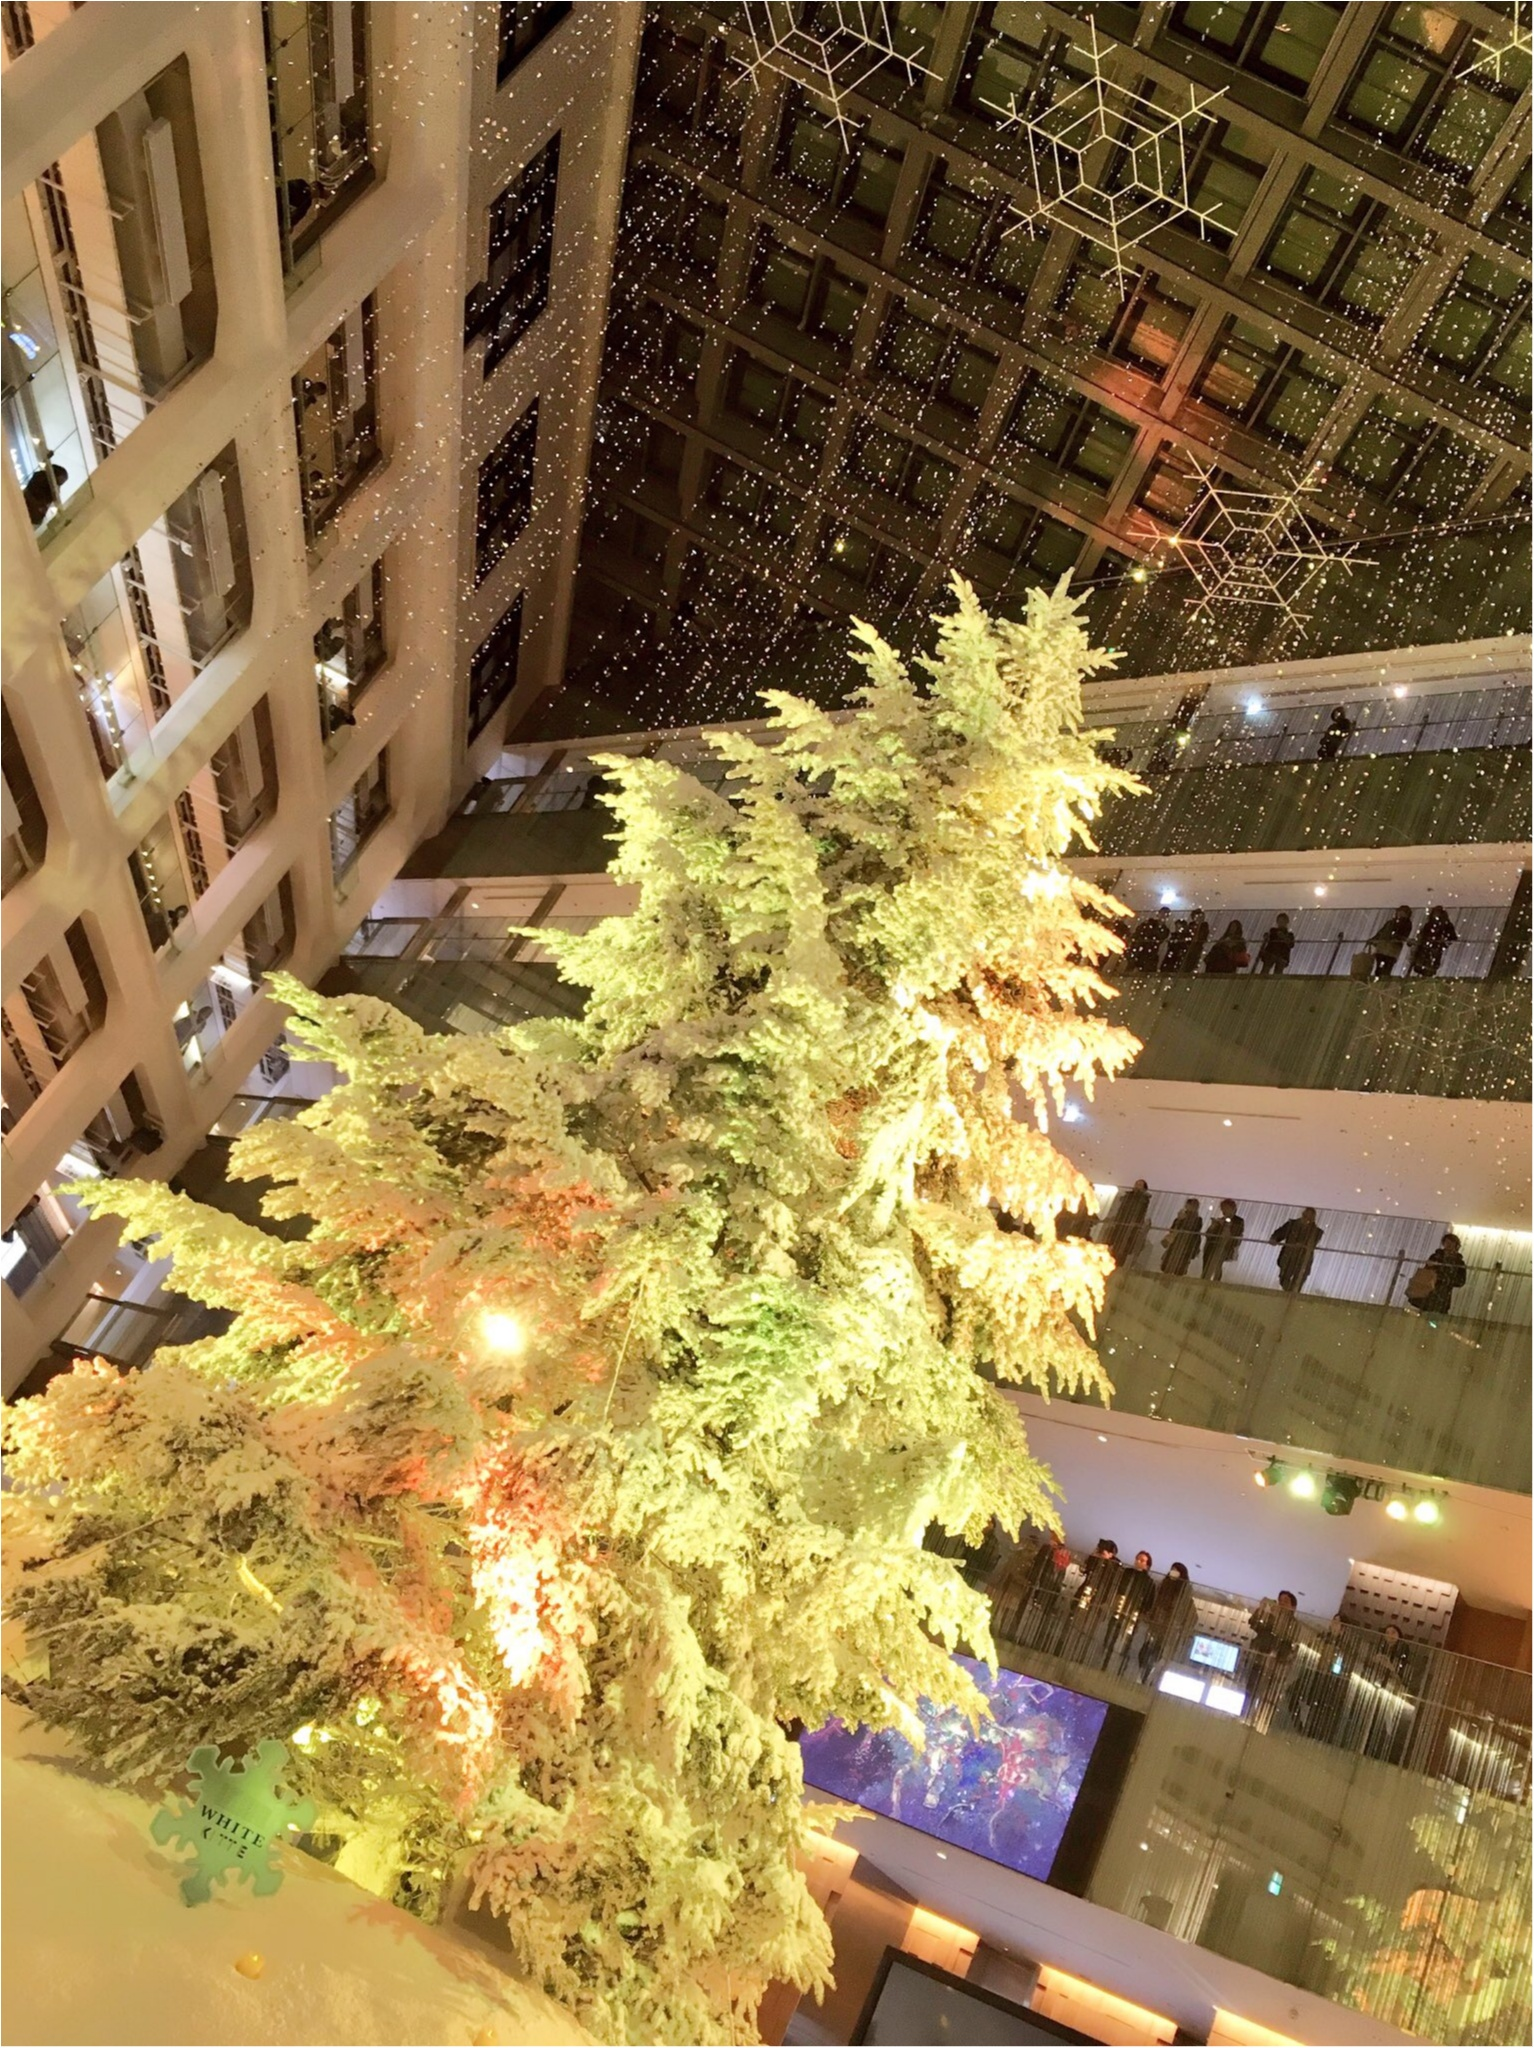 『KITTE』屋内に広がる白銀の世界…!日本最大級、本物のモミの木のクリスマスツリーが今年も点灯(*´ ˘ `*)♡_5